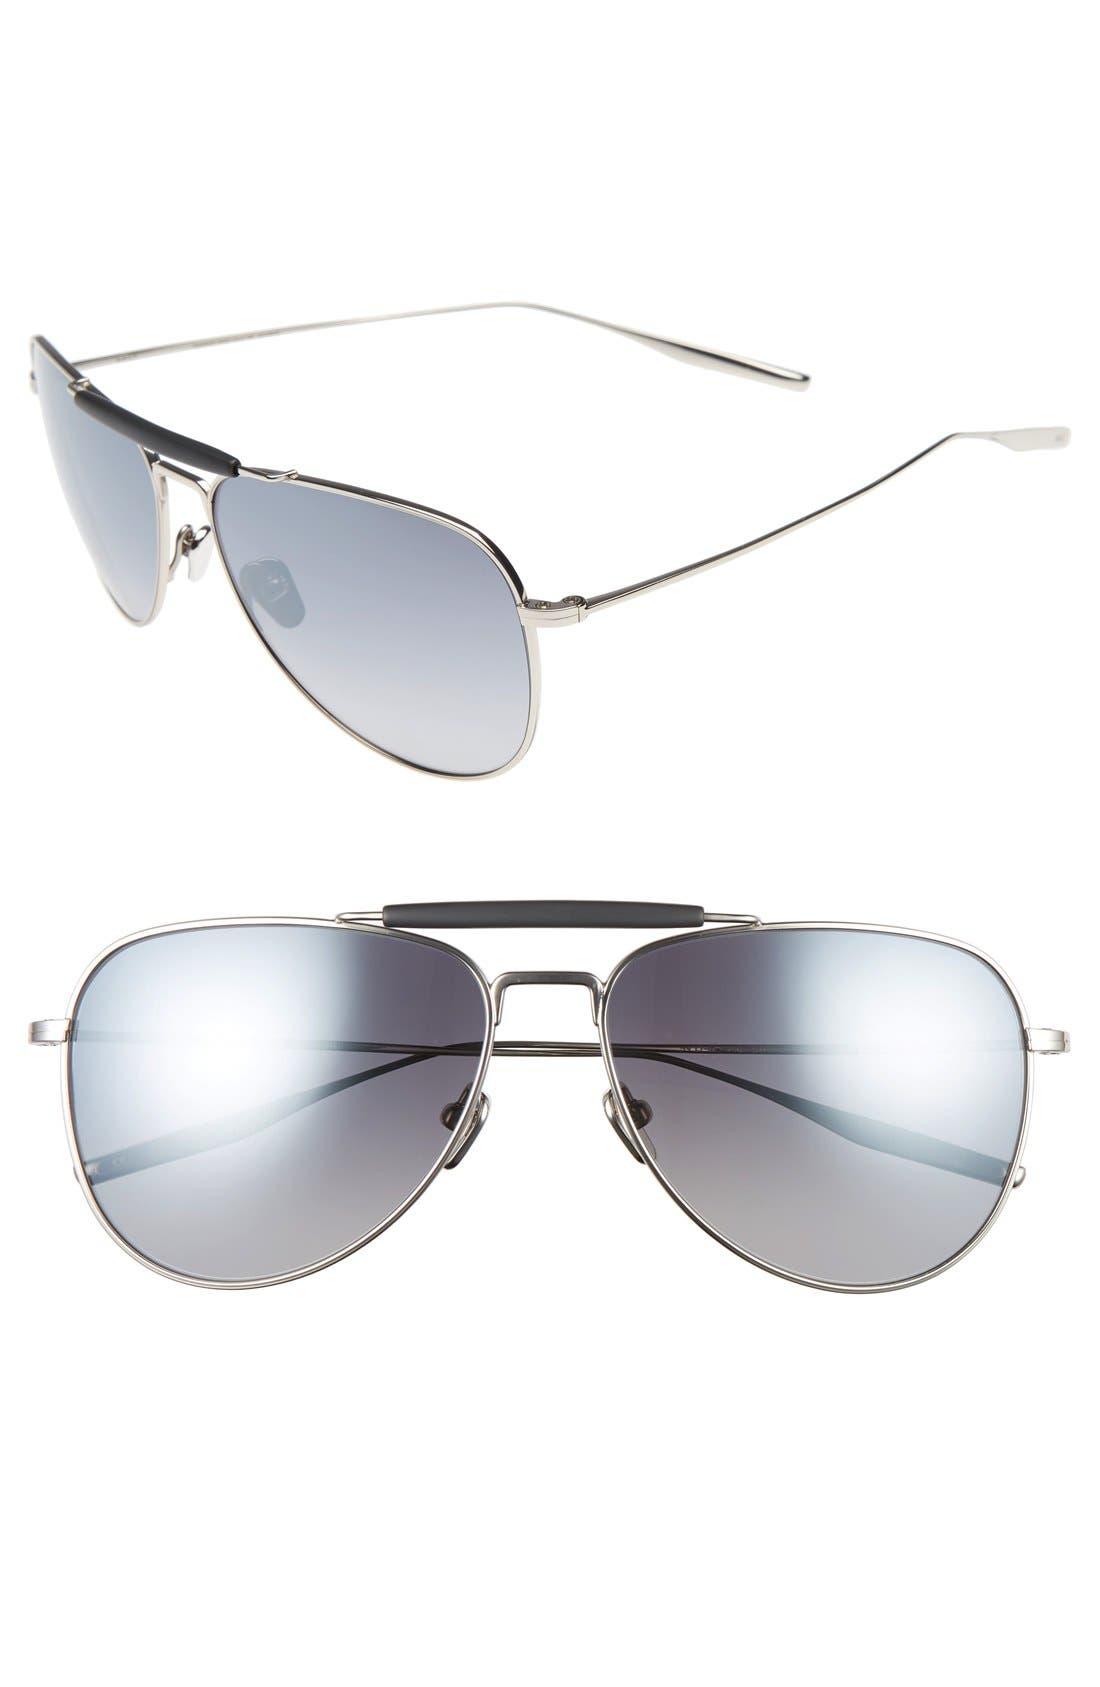 Alternate Image 1 Selected - SALT Striker 59mm Aviator Sunglasses